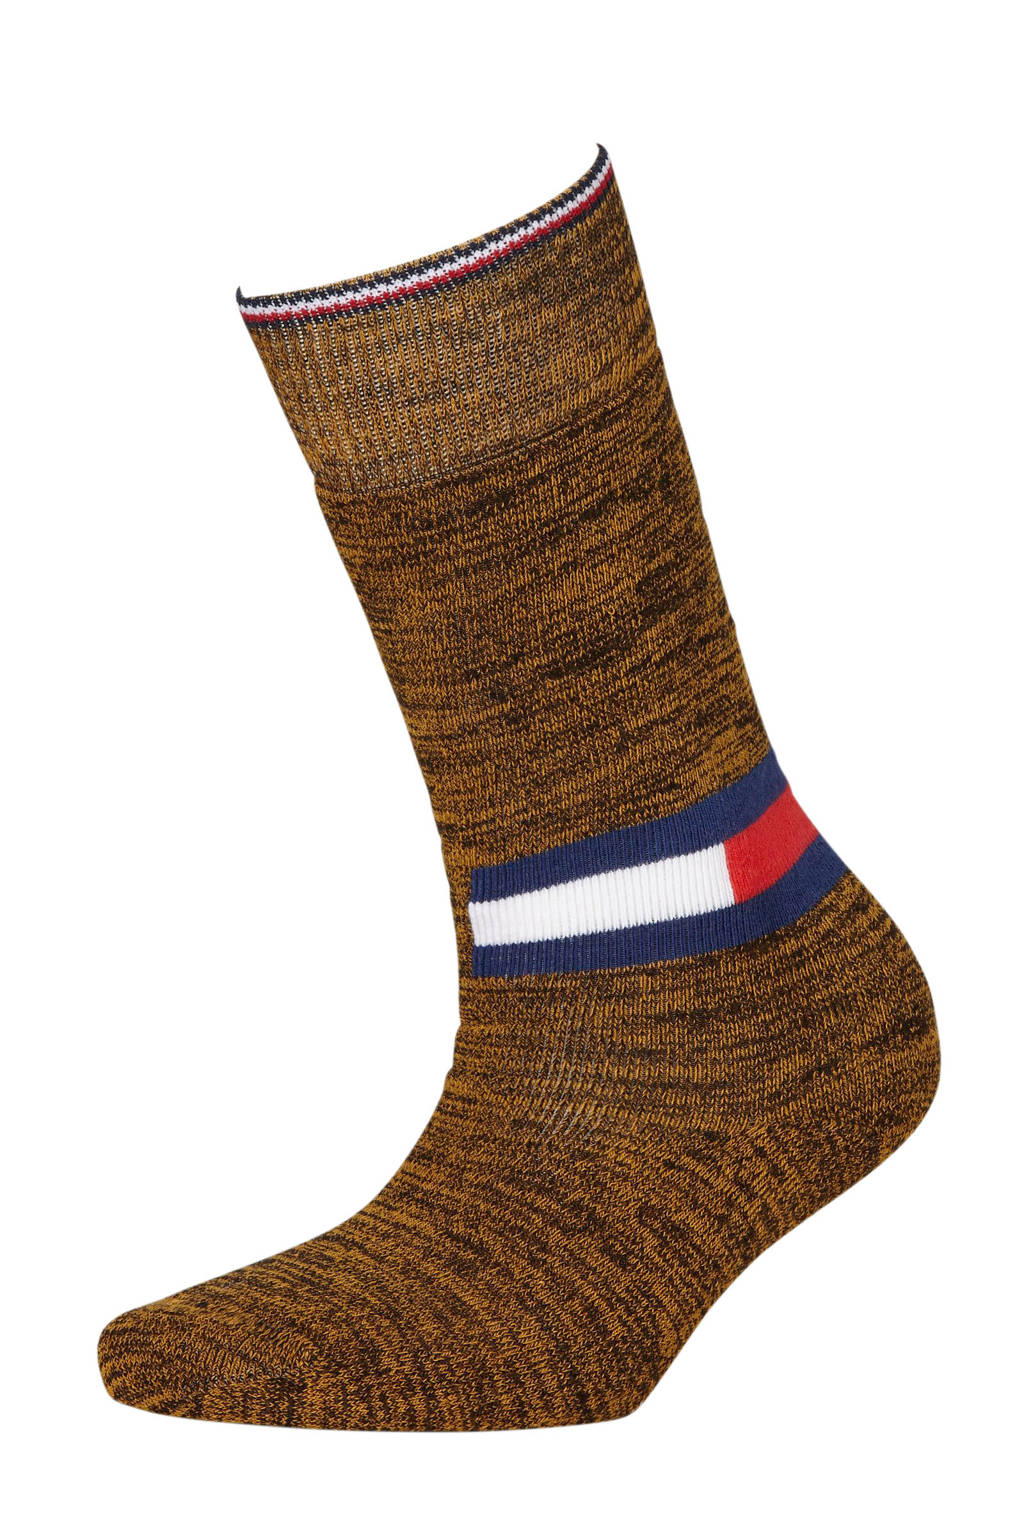 Tommy Hilfiger geméleerd knielange sokken zwart/goud, Zwart/goud